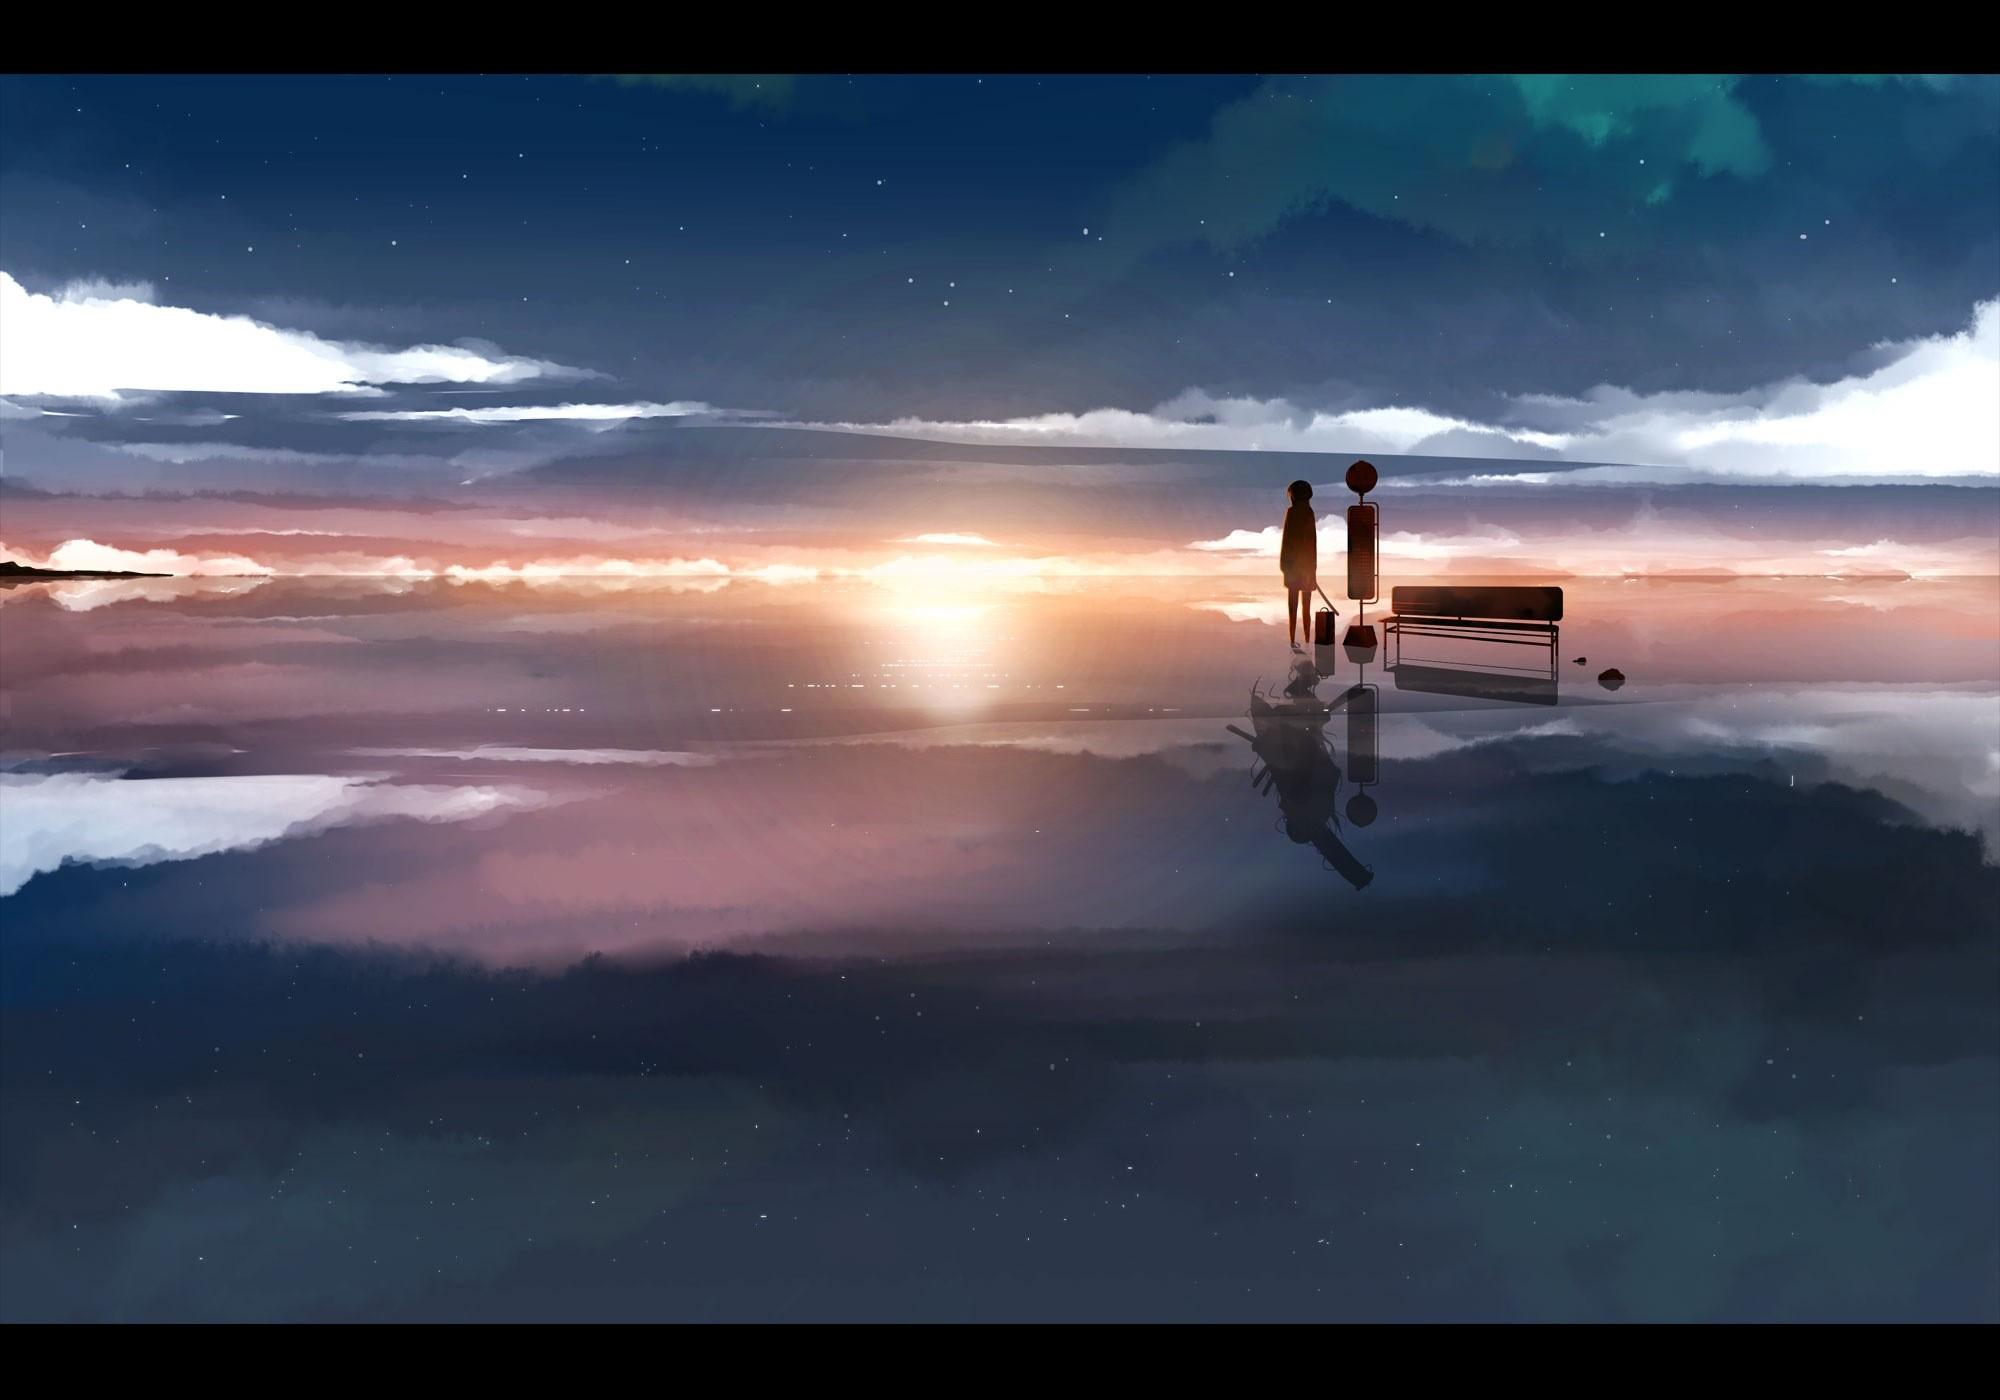 Sunlight Sunset Sea Reflection Sky Sunrise Manga Evening Morning Sun Horizon Atmosphere Dusk Cloud Dawn Ocean